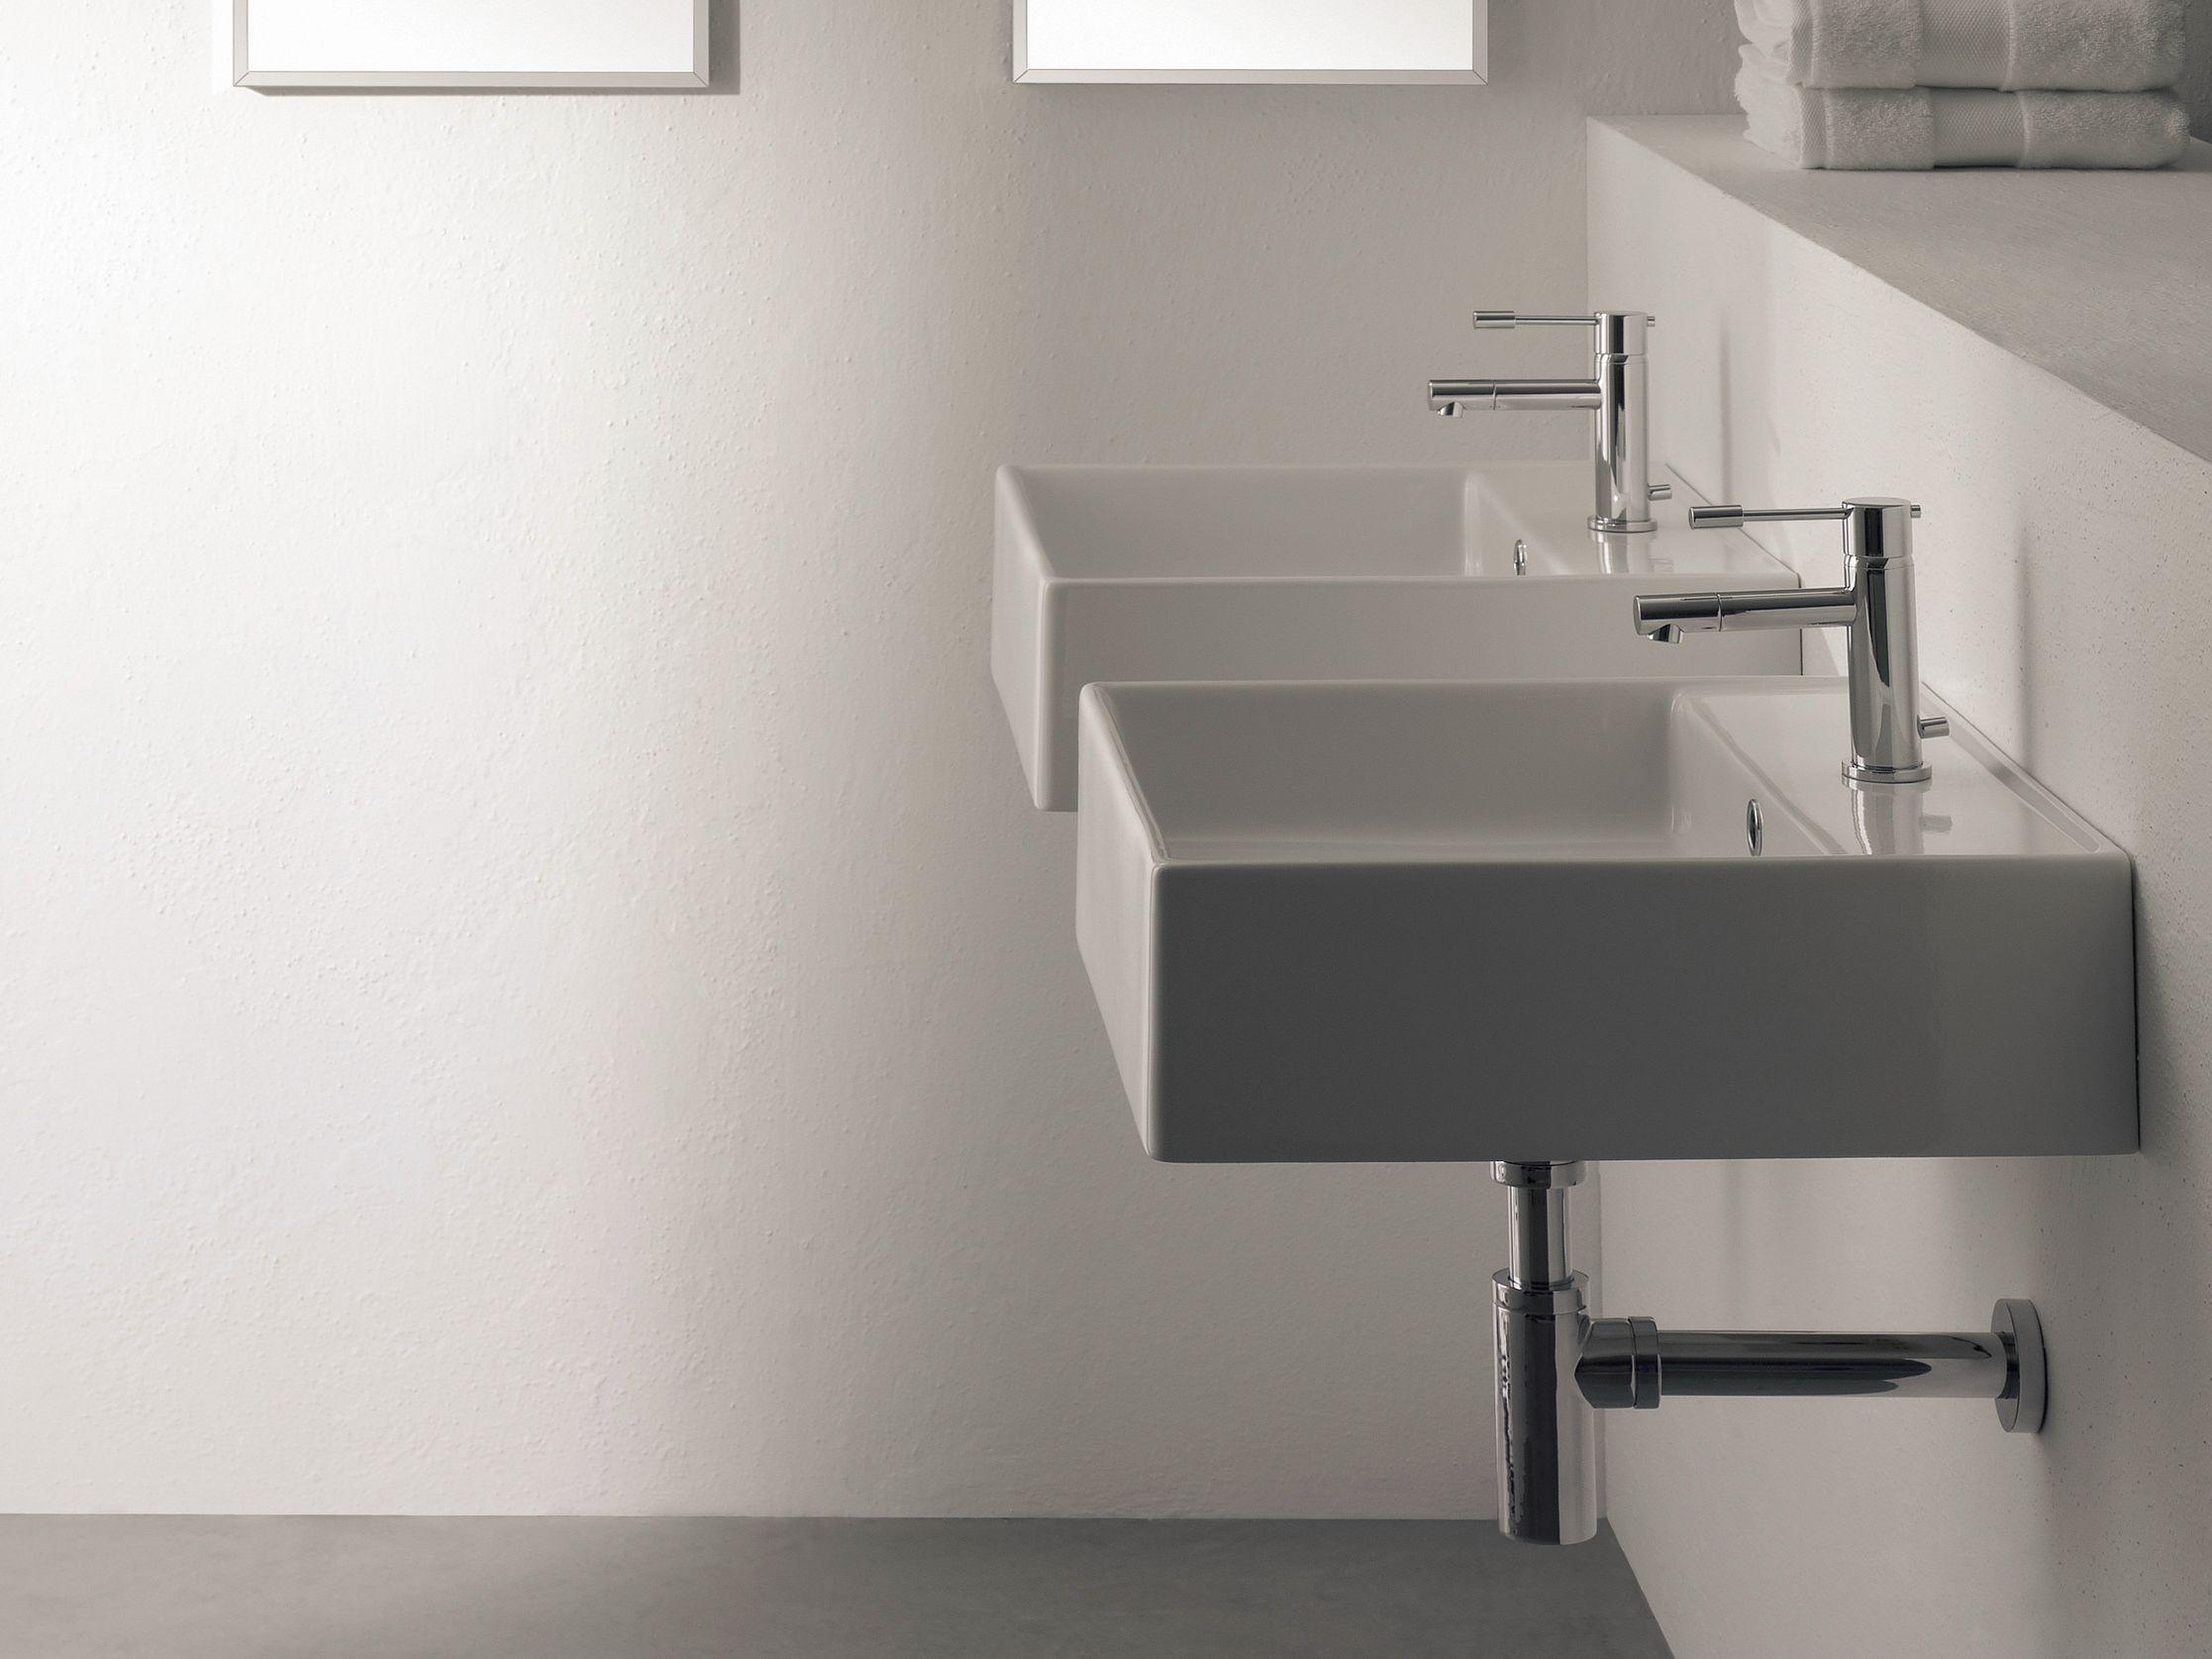 h nge waschbecken aus keramik teorema 30r by scarabeo. Black Bedroom Furniture Sets. Home Design Ideas